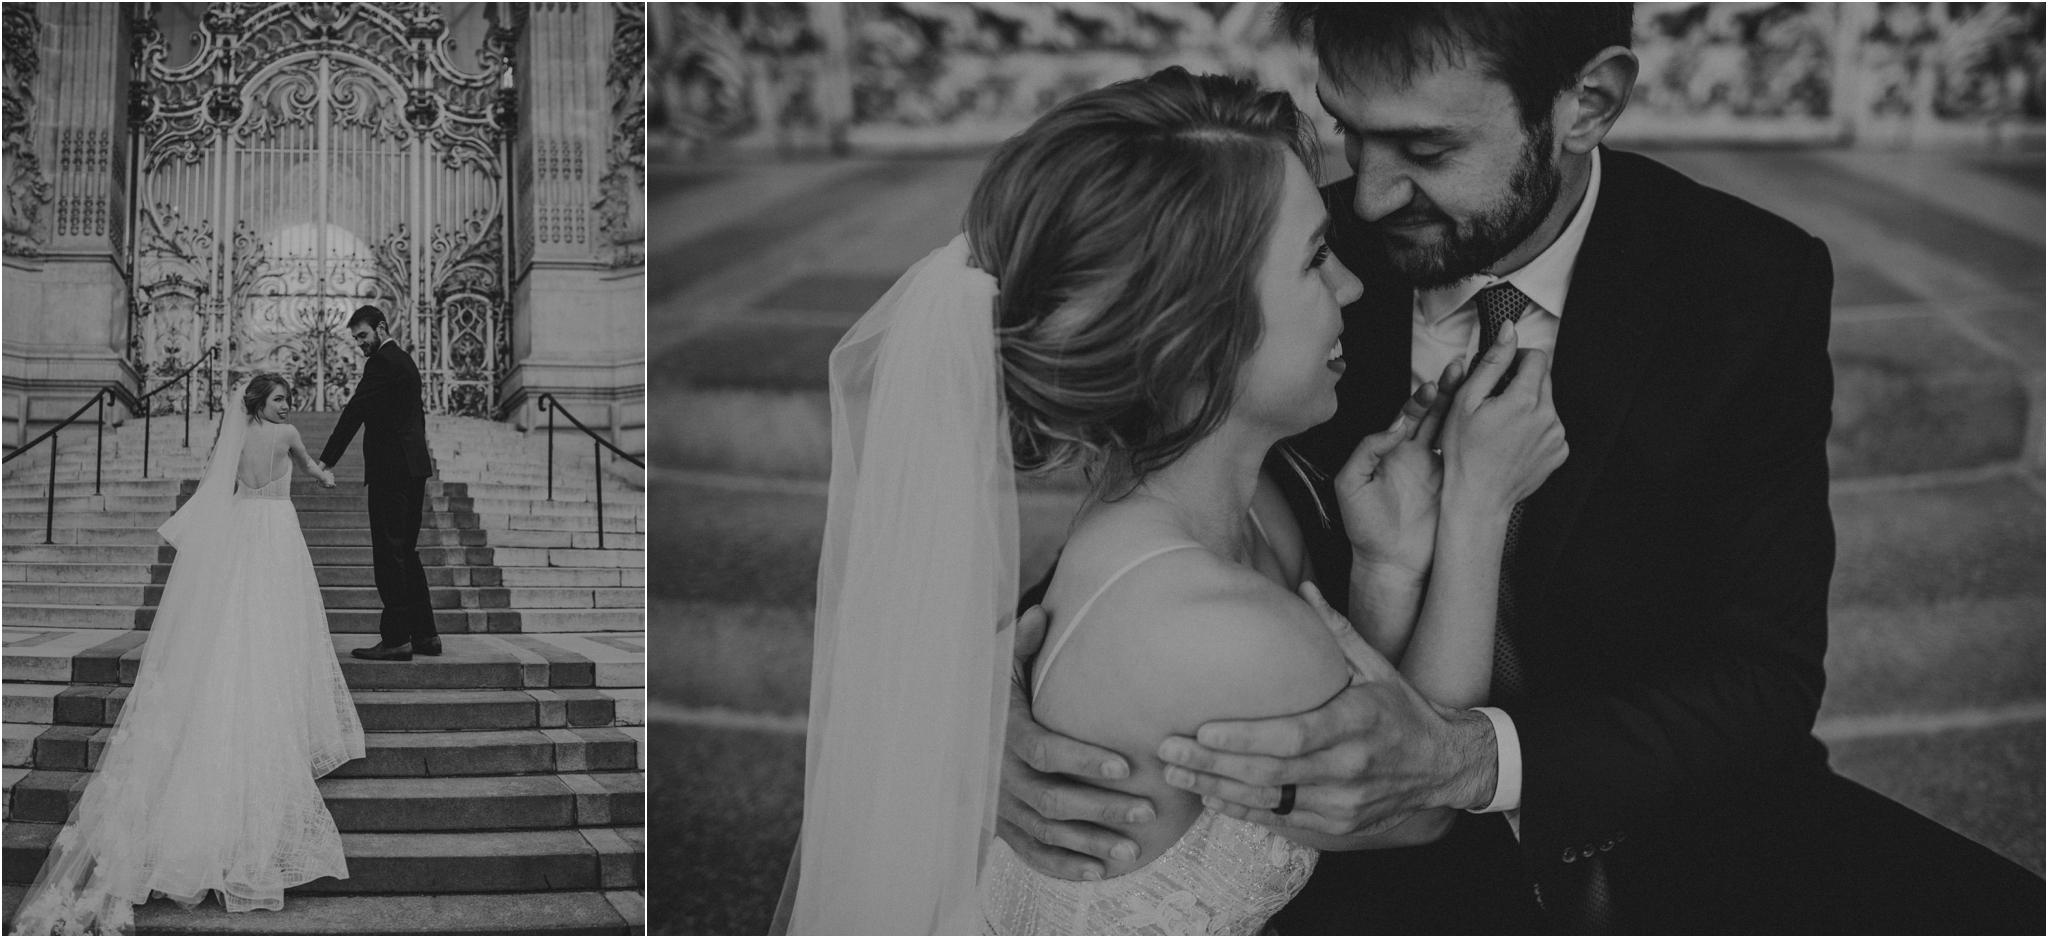 miranda-and-jared-paris-elopement-destination-wedding-photographer-076.jpg